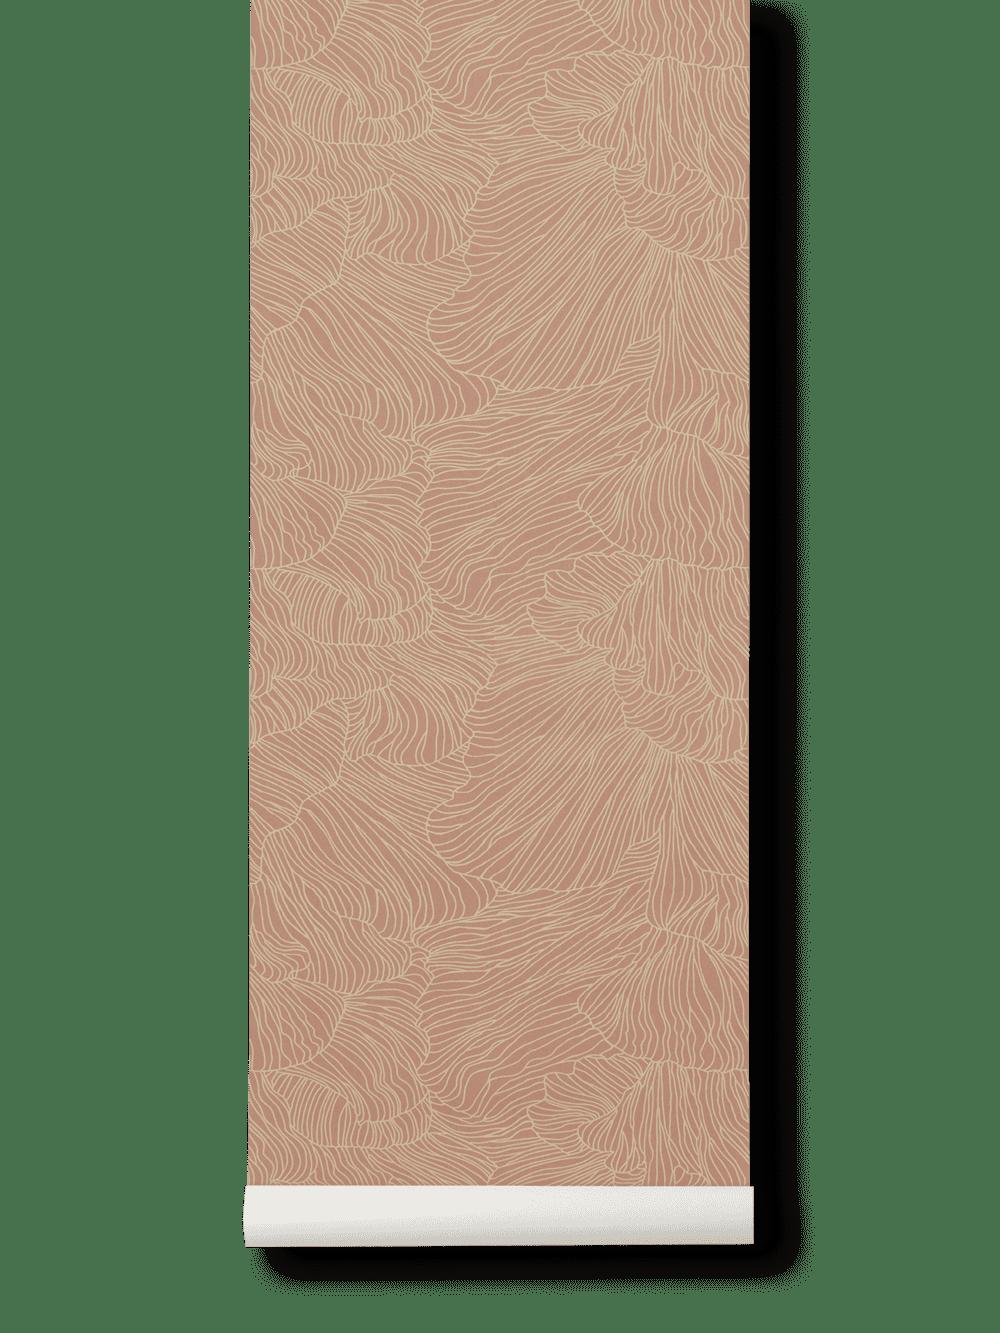 Coral Wallpaper- Dusty Rose/Beige